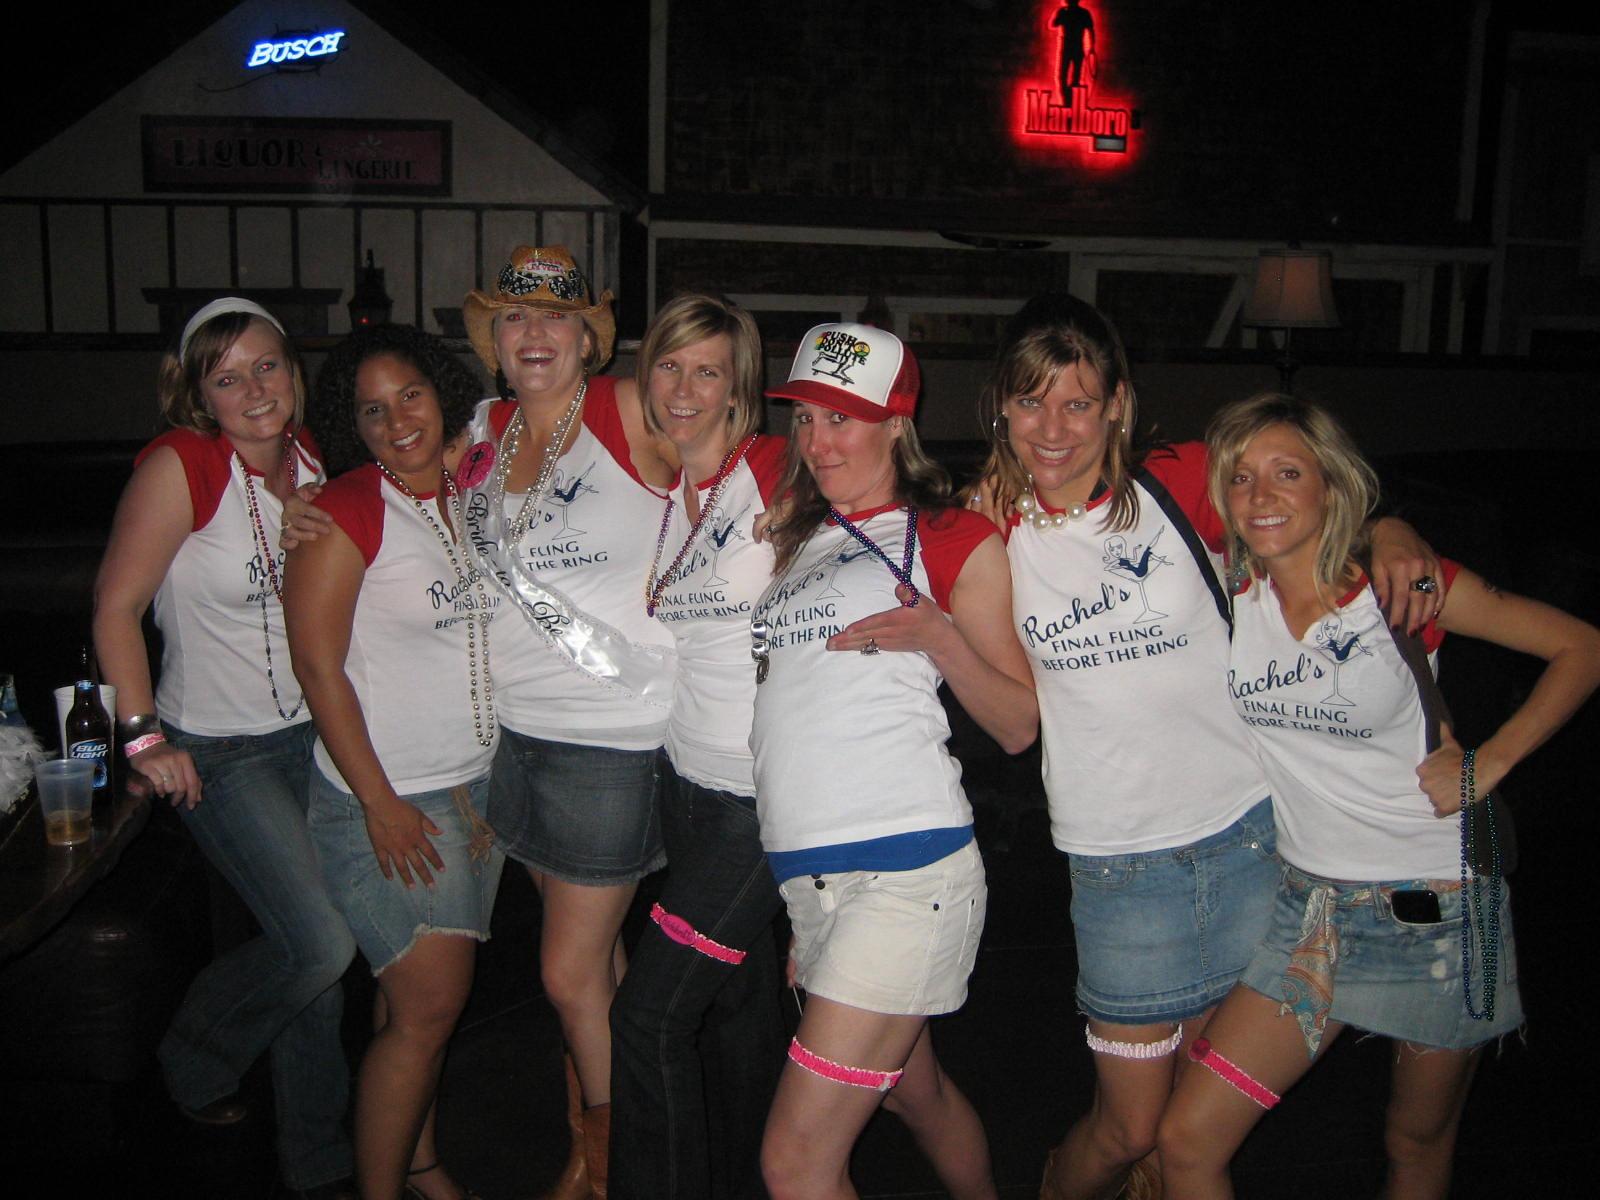 Design your own t shirt las vegas - Girls Gone Country T Shirt Photo